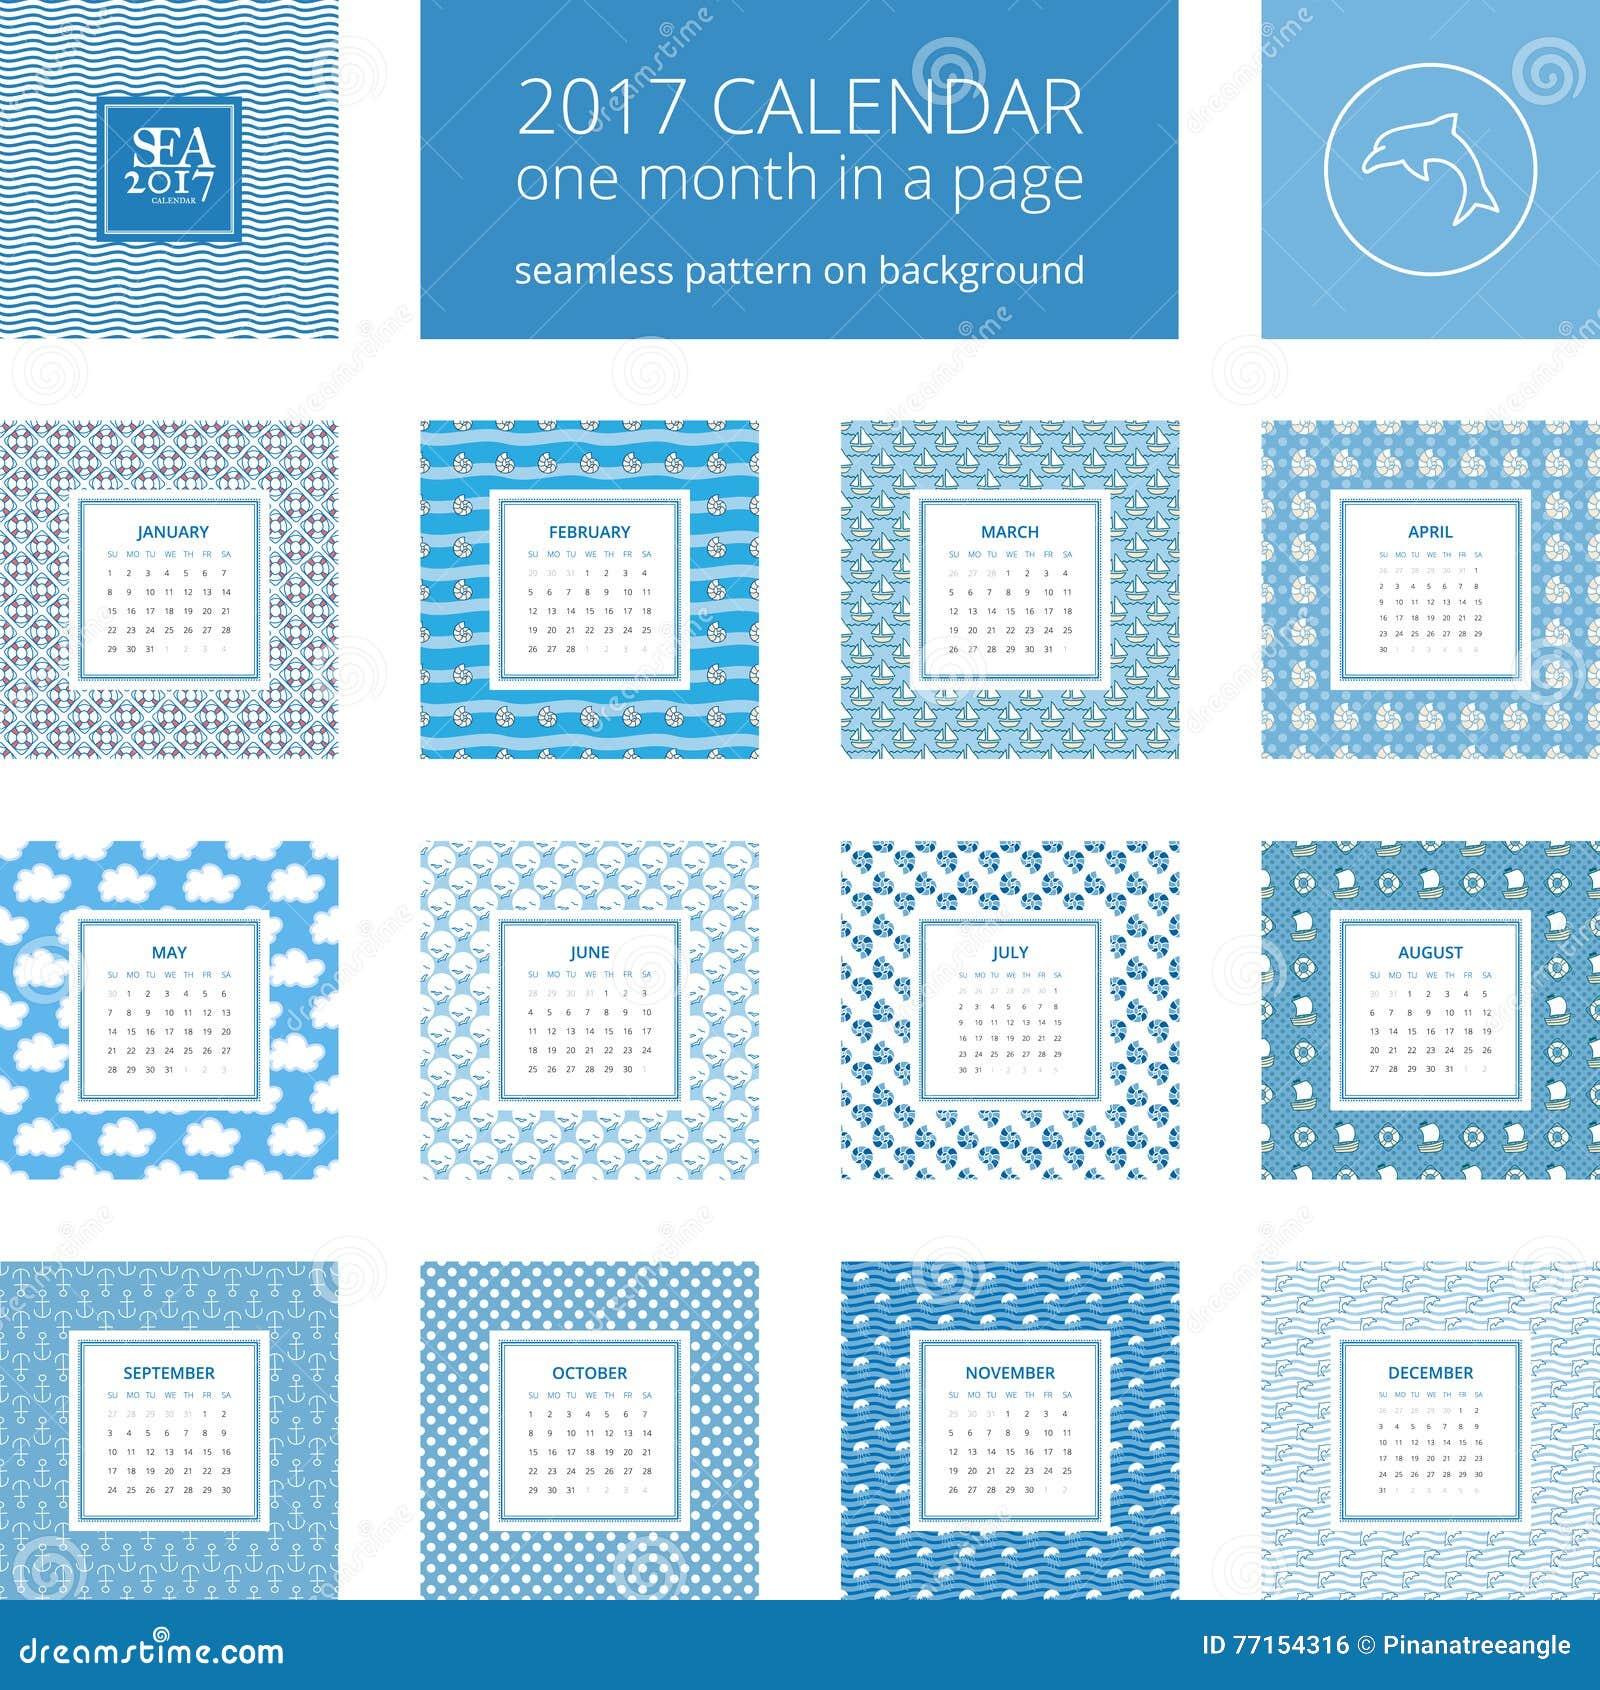 New Year Calendar Template Stock Vector Illustration Of Dolphin - Calendar format